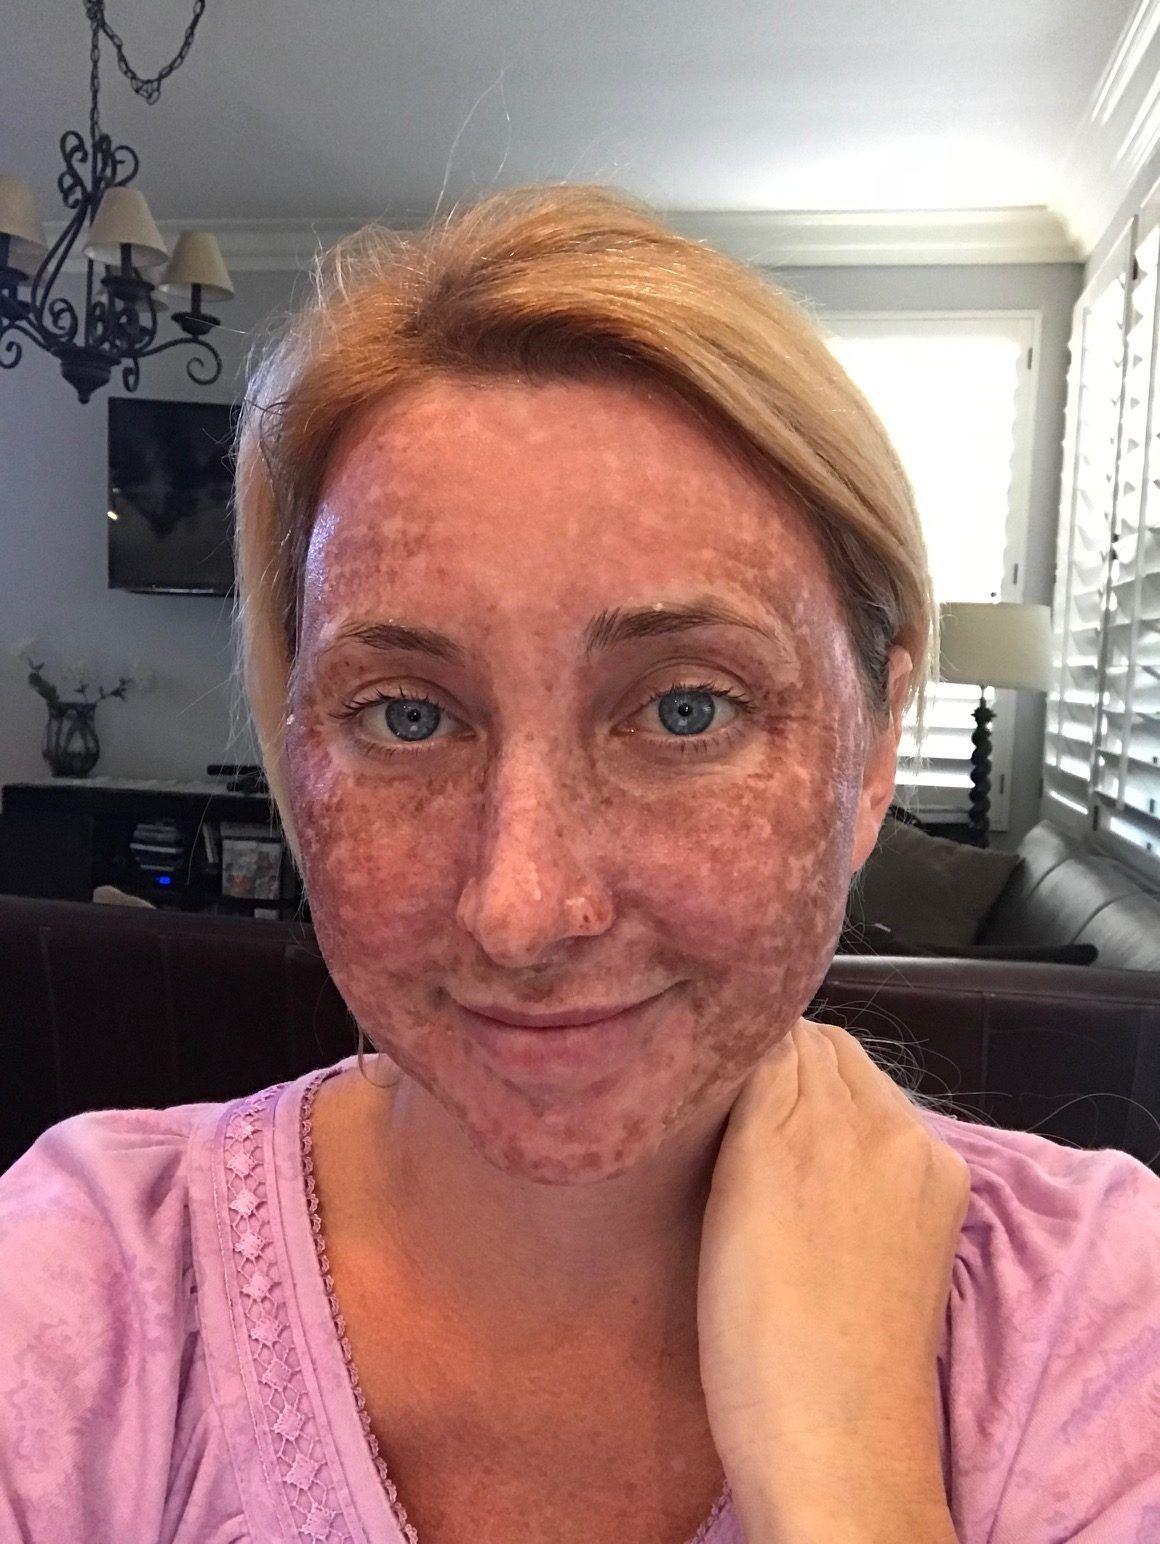 Darkening Of Skin After A C02 Laser At Cosmeticare In 2020 Laser Facial Laser Treatment Face Laser Peel